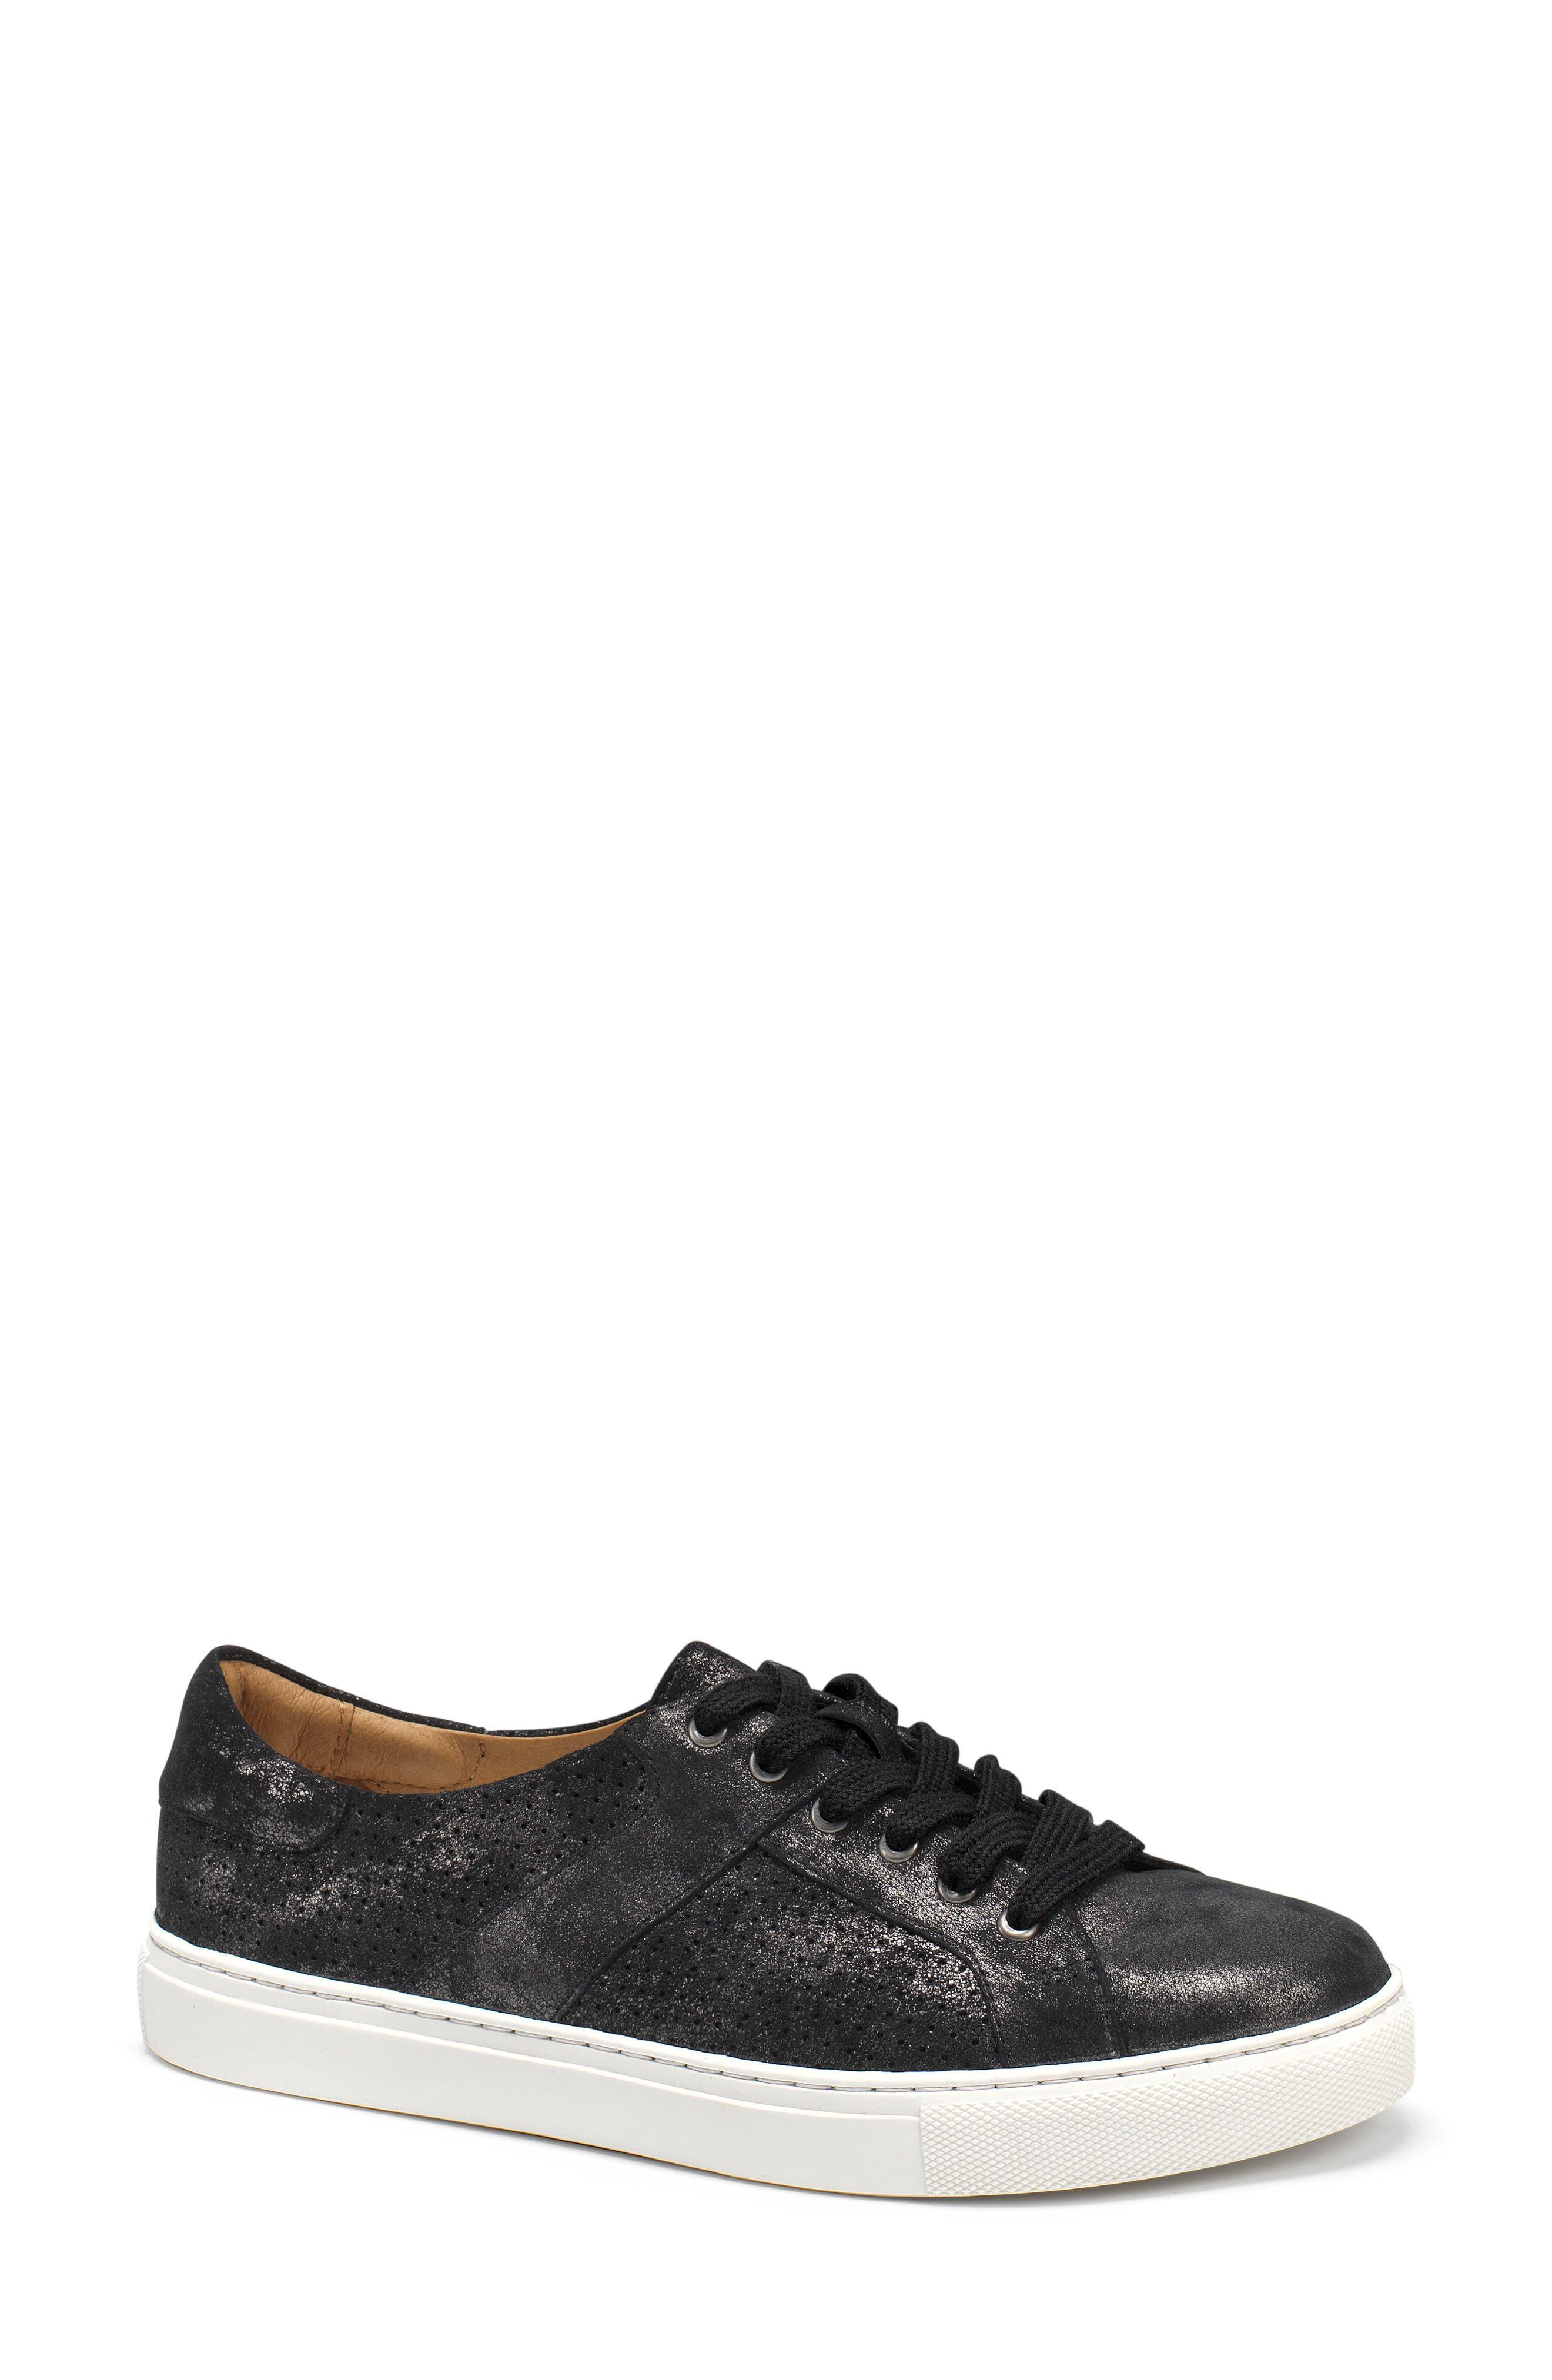 Trask Lindsey Sneaker- Black